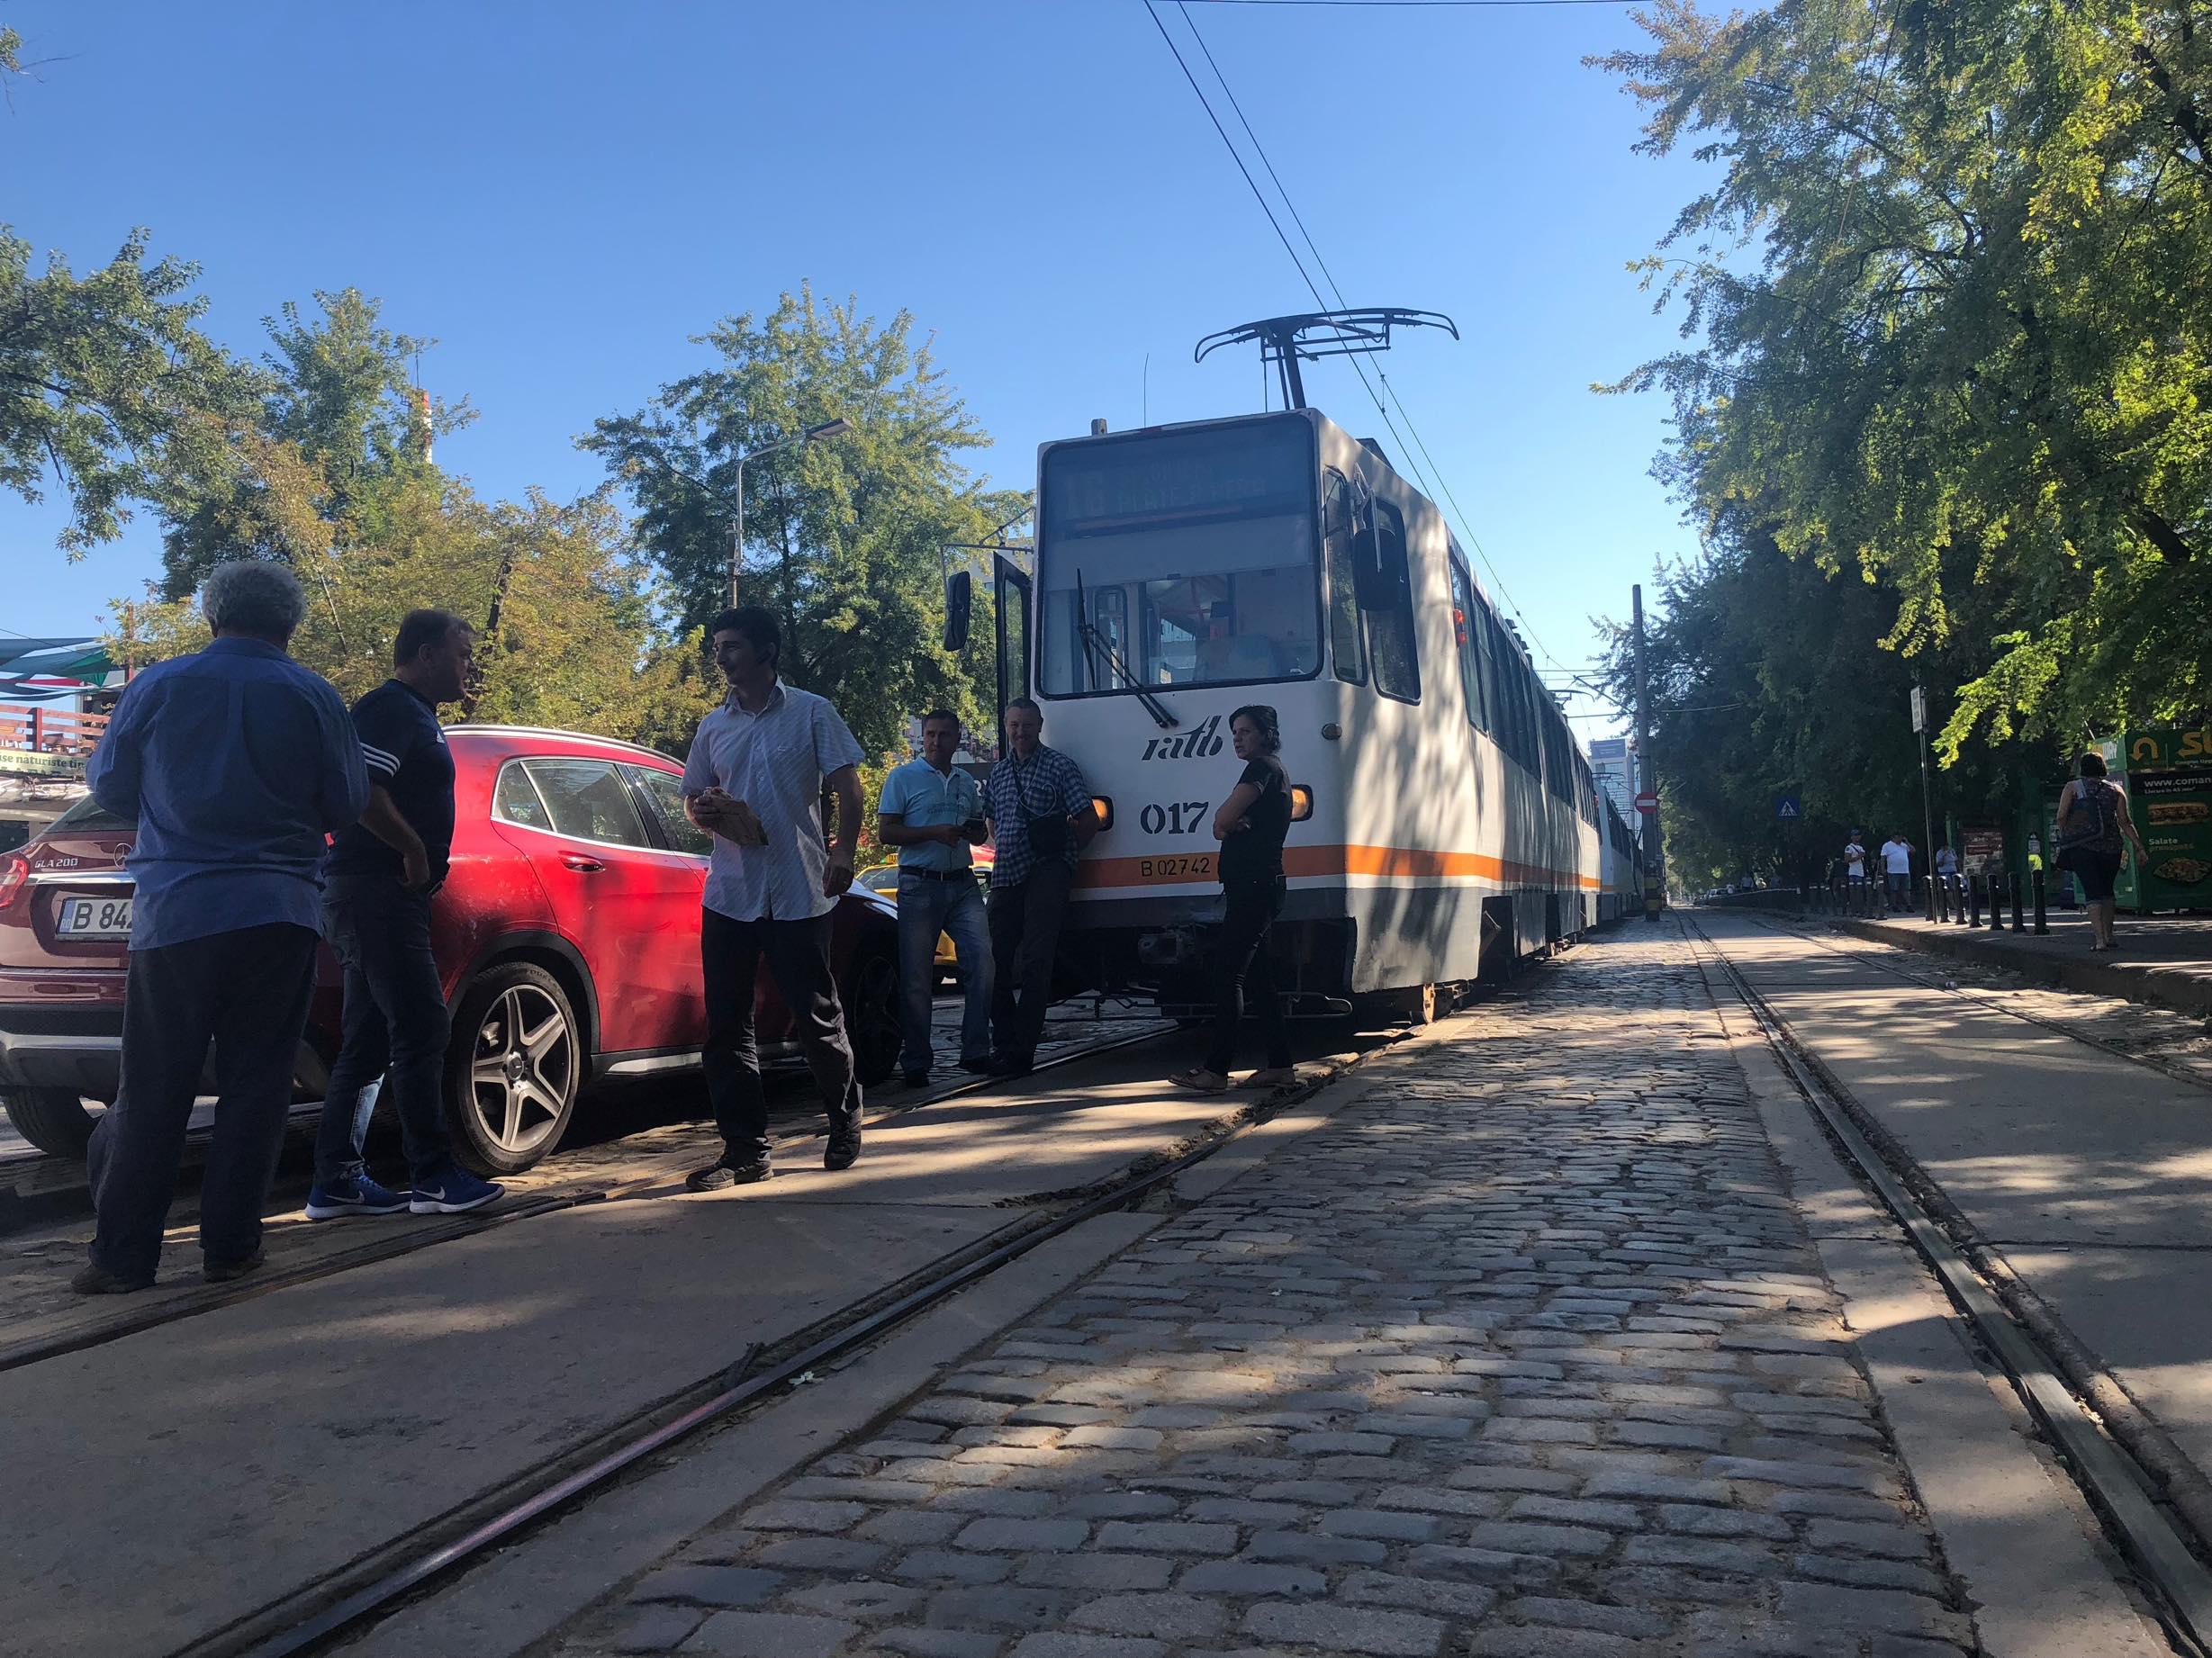 #salvatipipera / Tramvaie blocate în zona Pipera din cauza unei șoferițe care a parcat pe linie - VIDEO